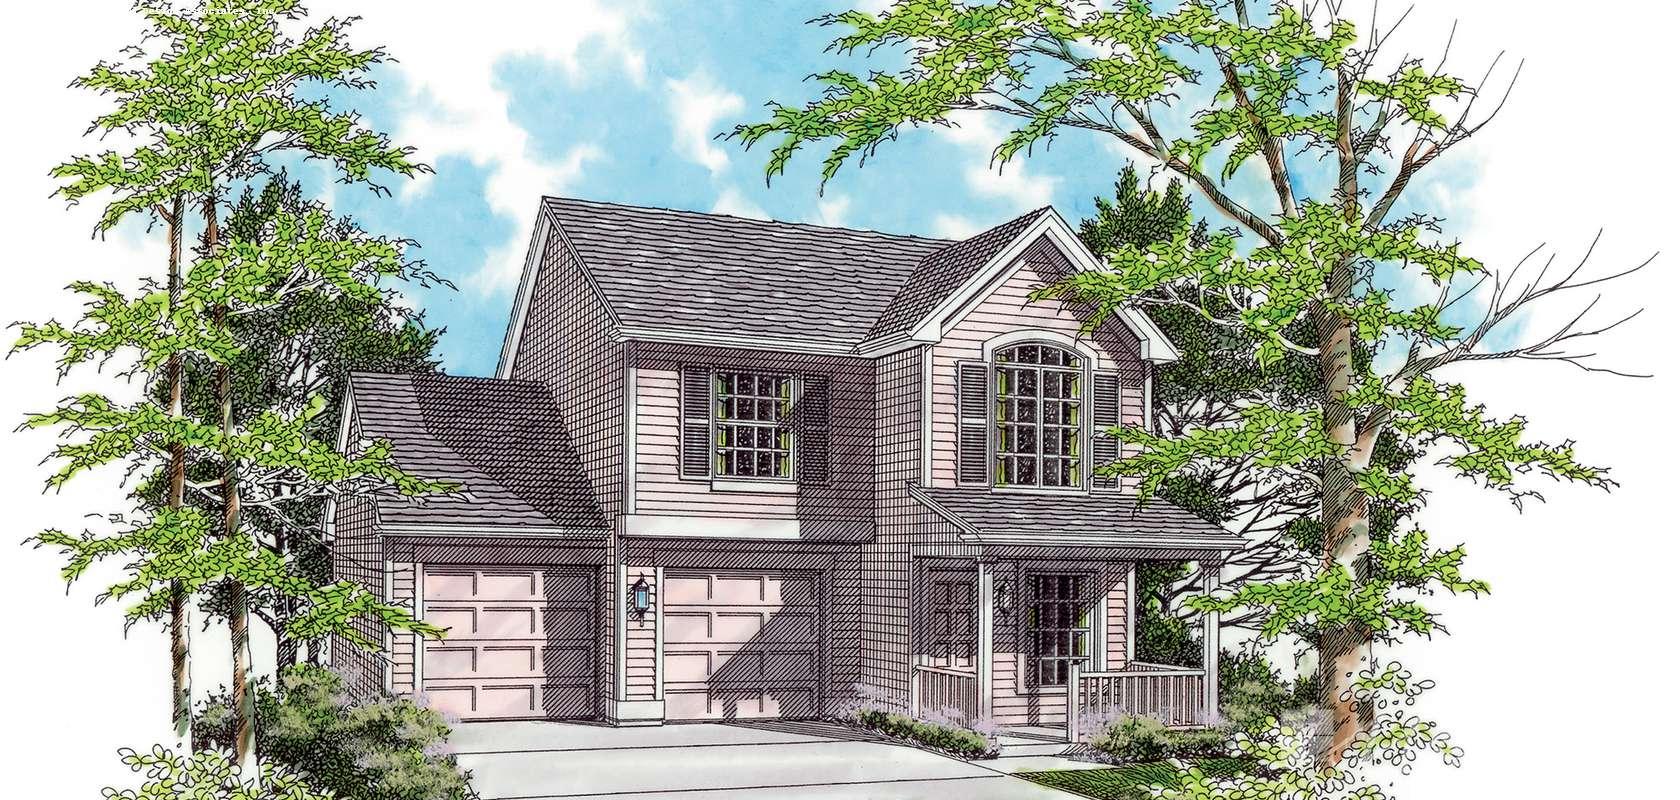 Mascord House Plan 2157: The Dayton